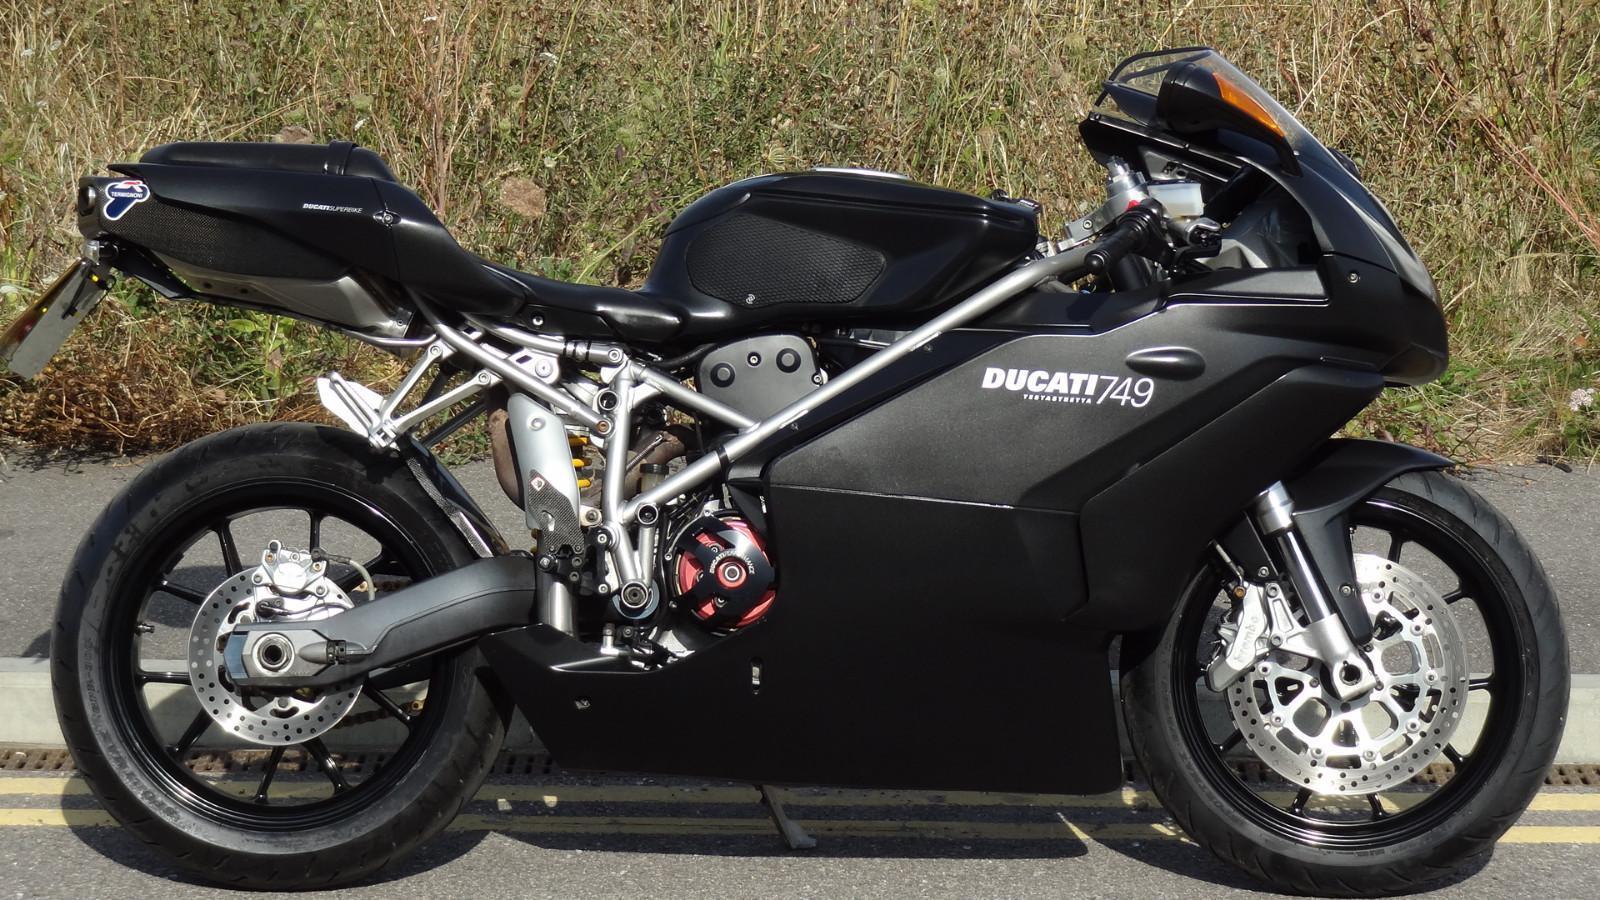 ducati 749 rh evolutionmotorcycles com ducati 999 owners manual pdf ducati 749 owners manual pdf